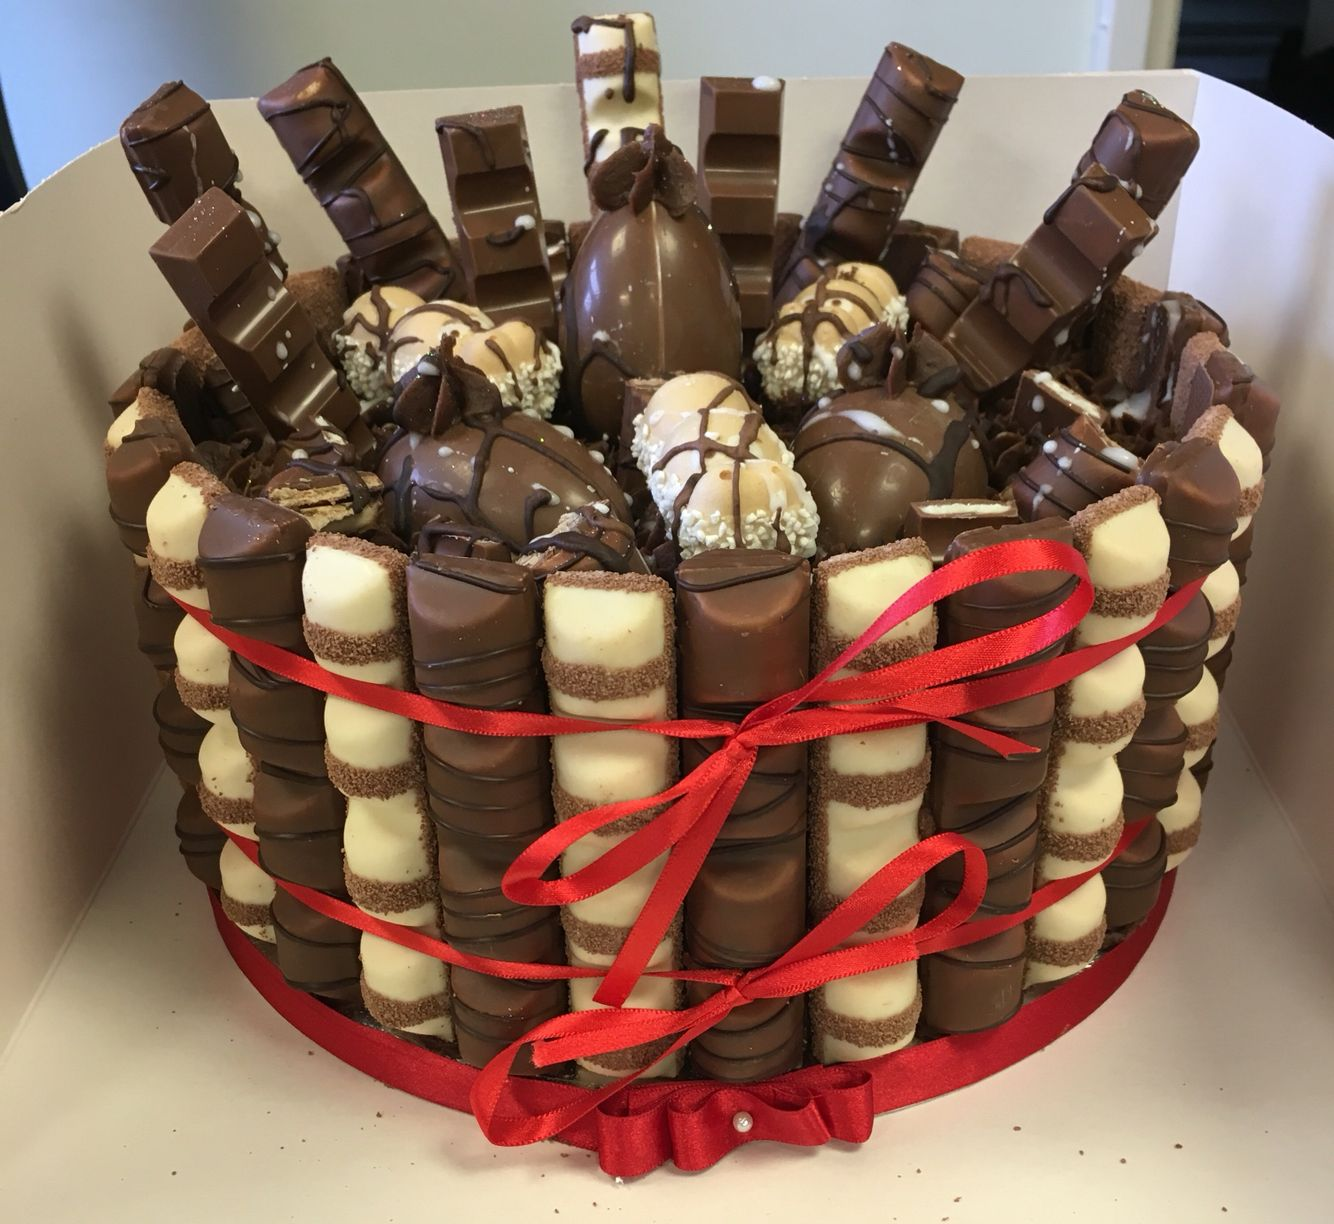 Kinder Bueno / chocolate / hippo / kinder egg cake made